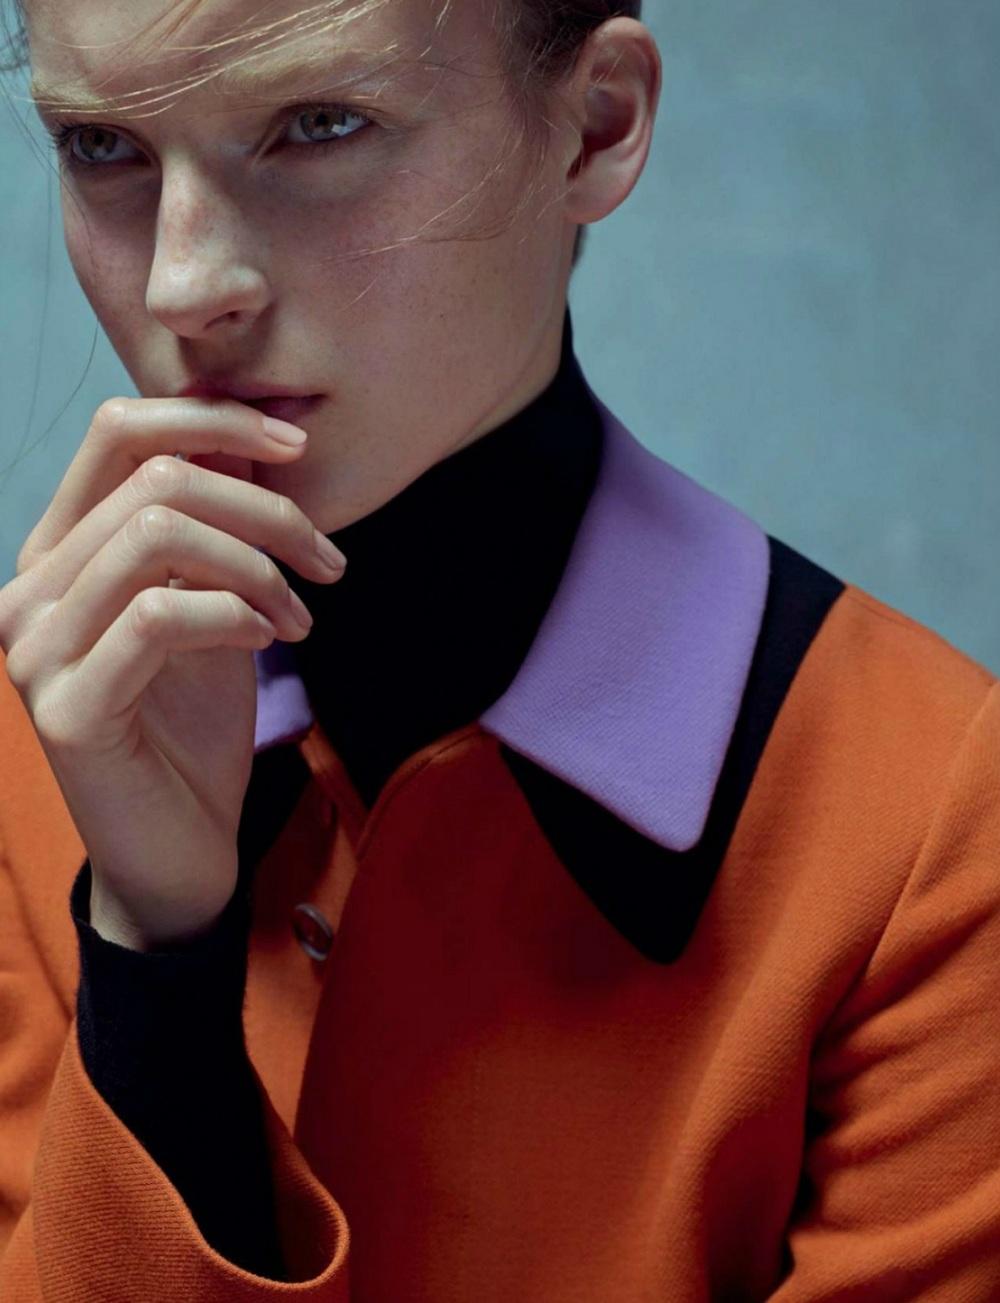 Karim-Sadli-Julia-Bergshoeff-Vogue-UK-January-2015-4.jpg